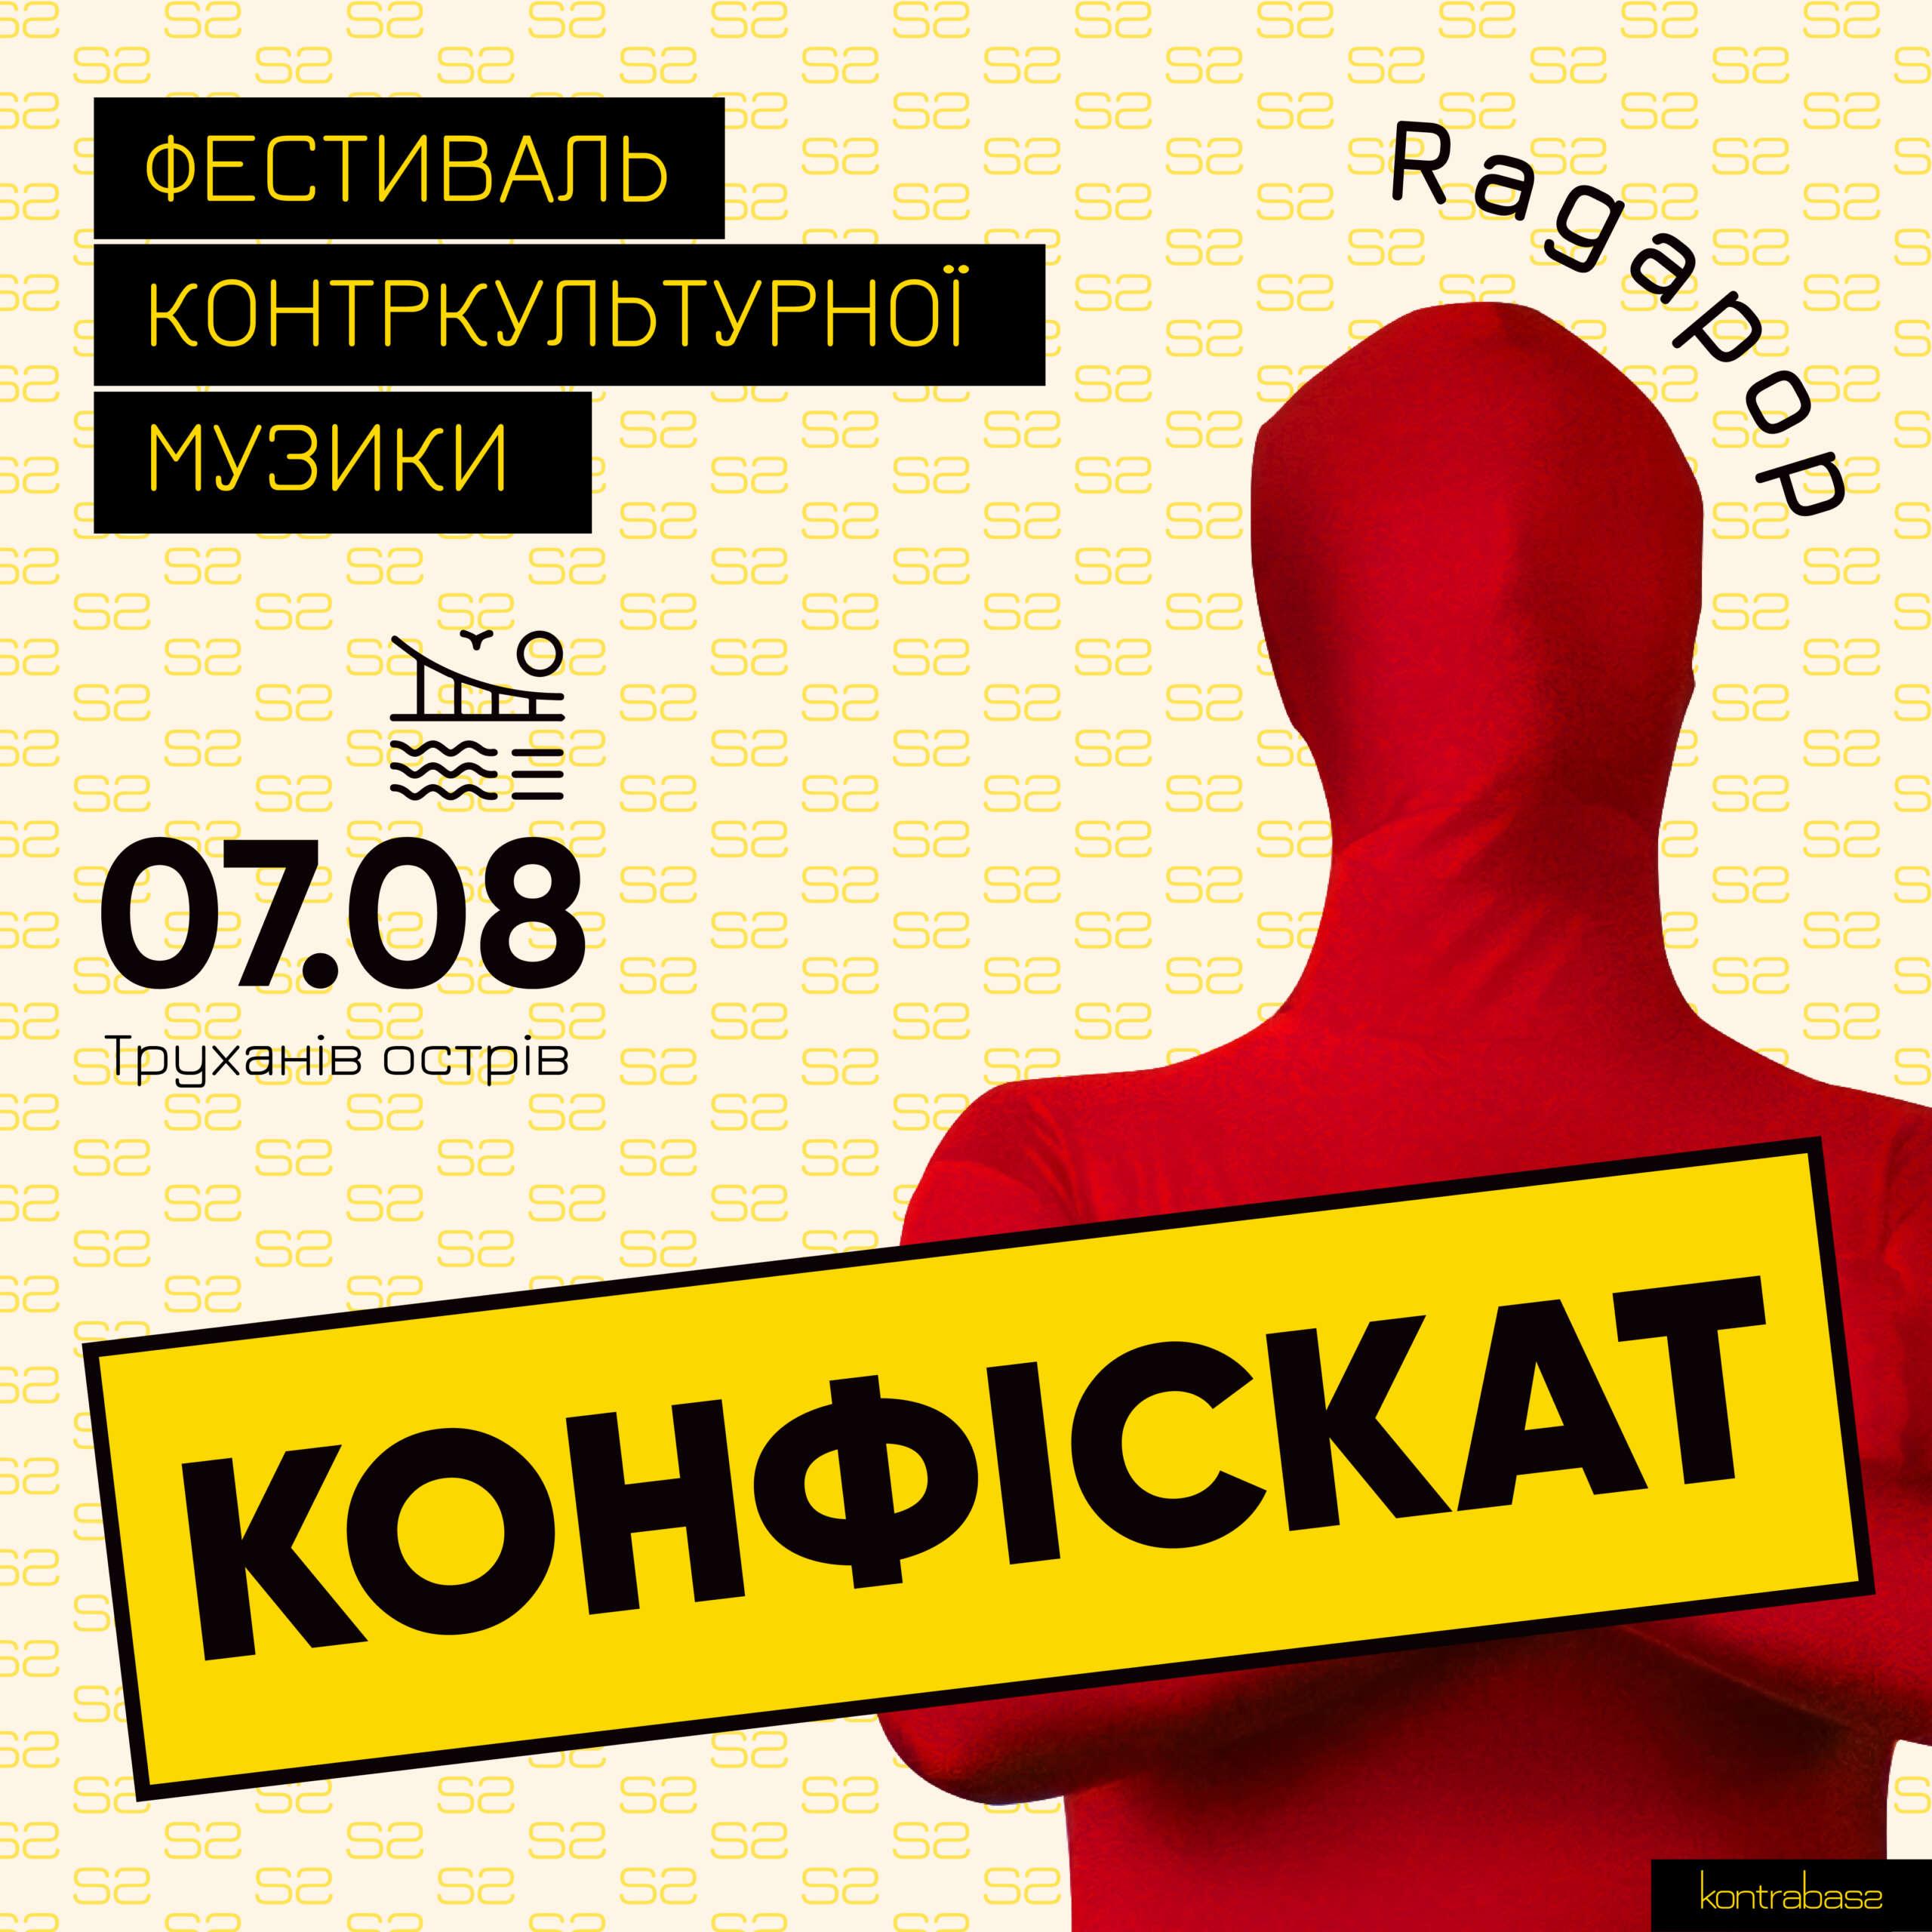 konfiskat-dtf-magazine3